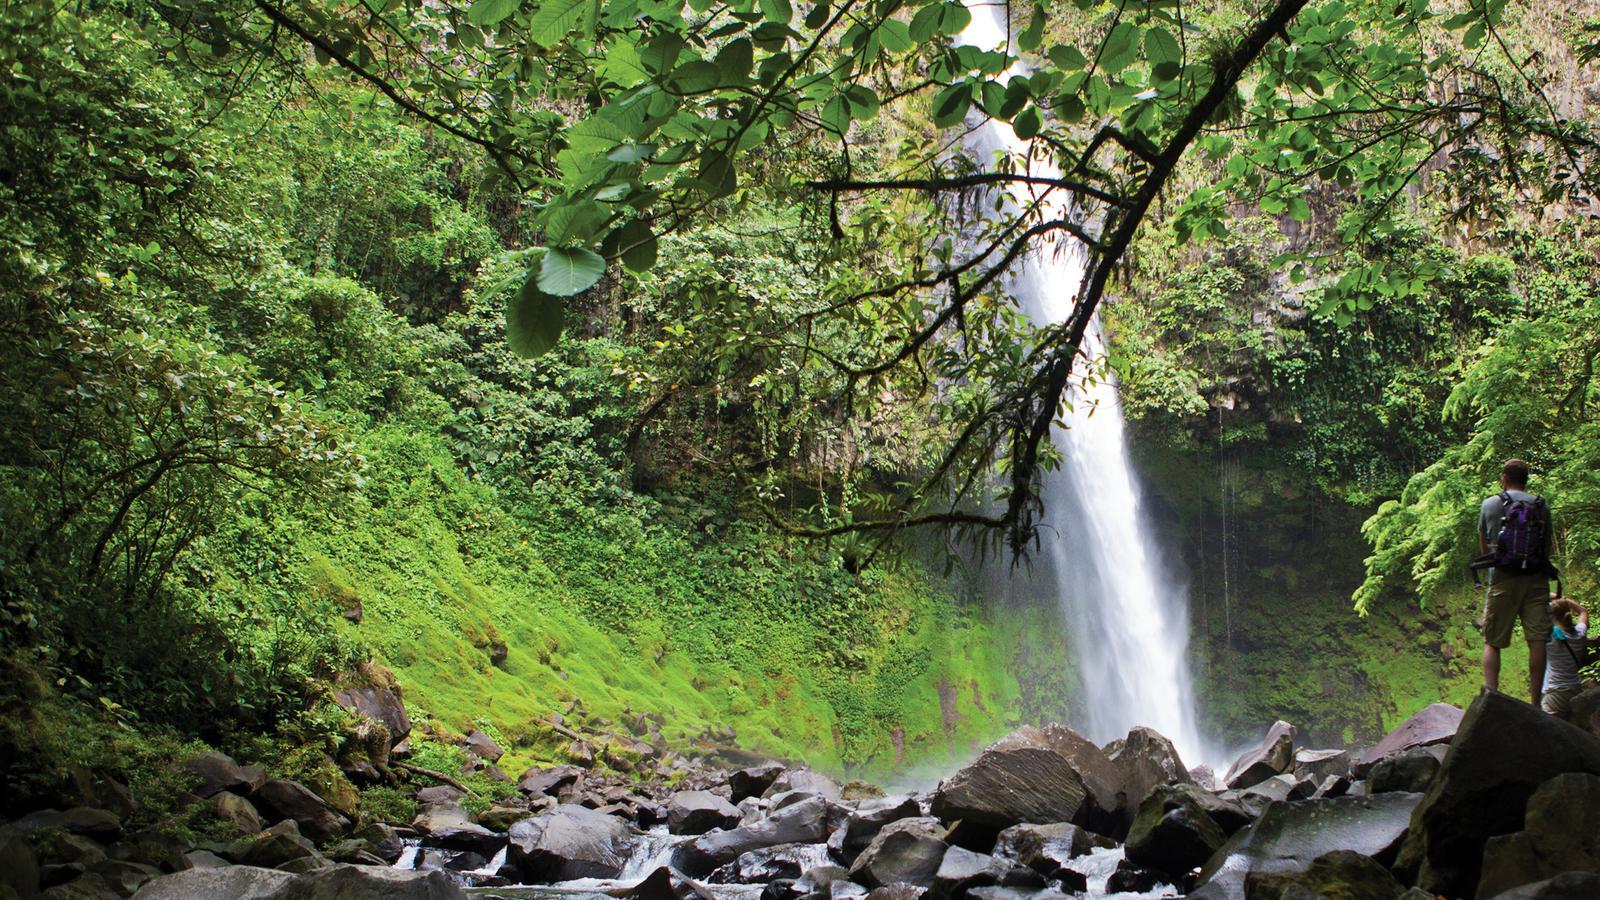 COSTA RICA MISSIONS TRIP -